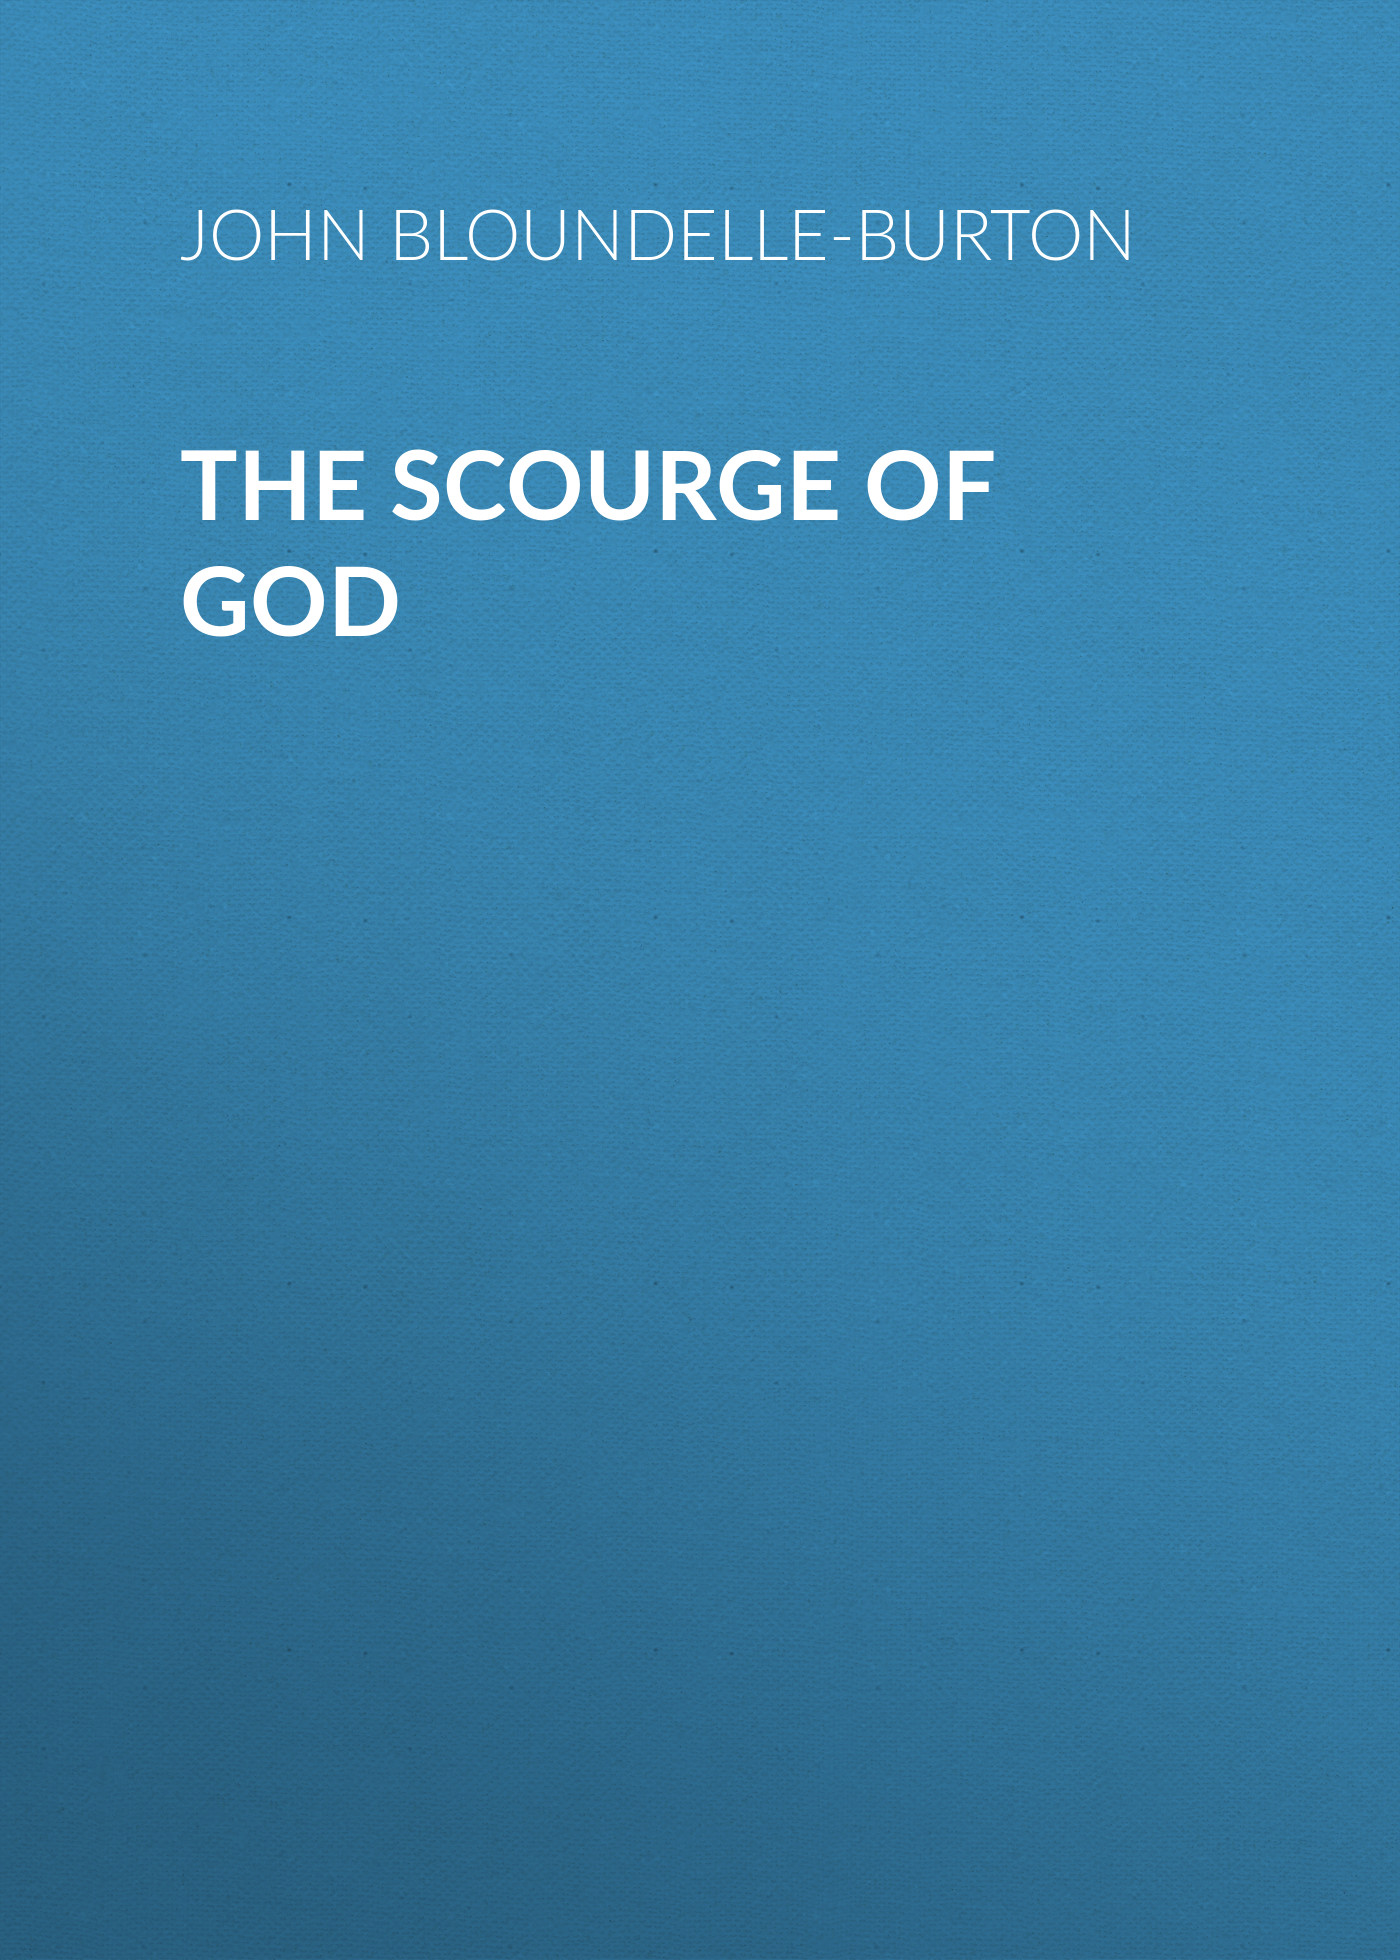 John Bloundelle-Burton The Scourge of God